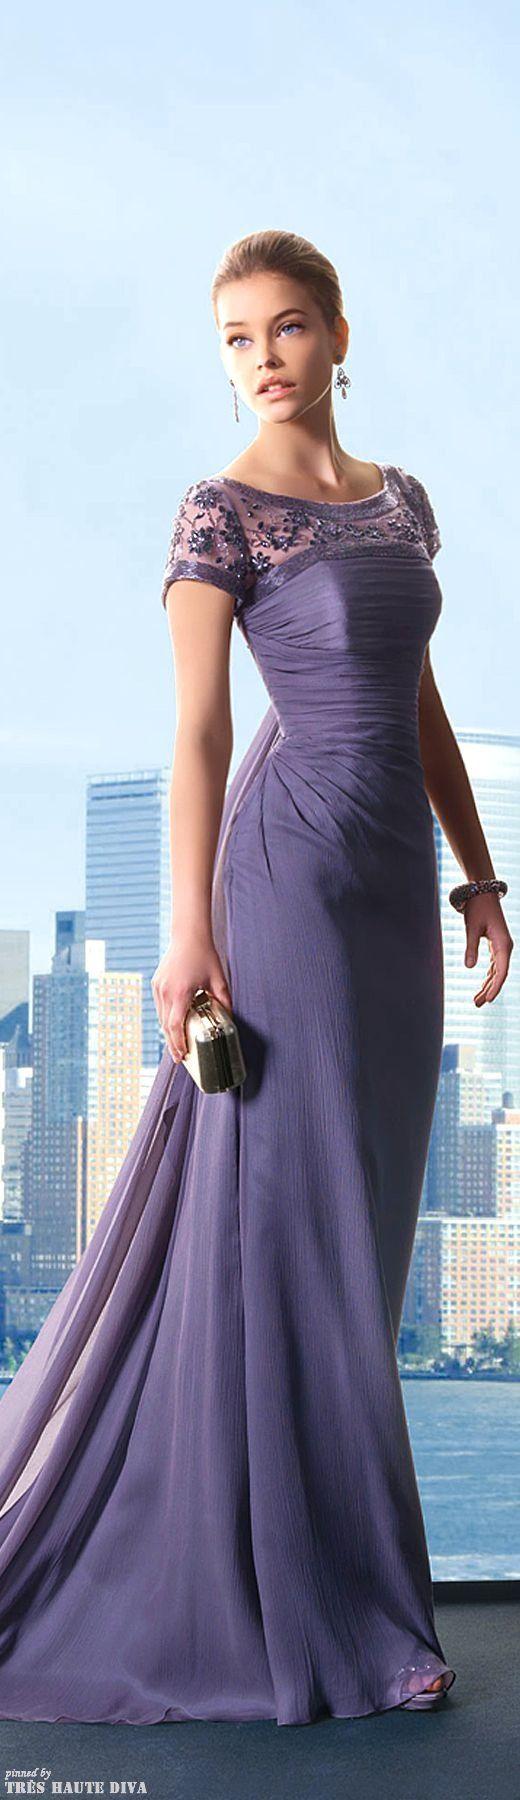 104 best Mis damas images on Pinterest | Wedding souvenir, Wedding ...